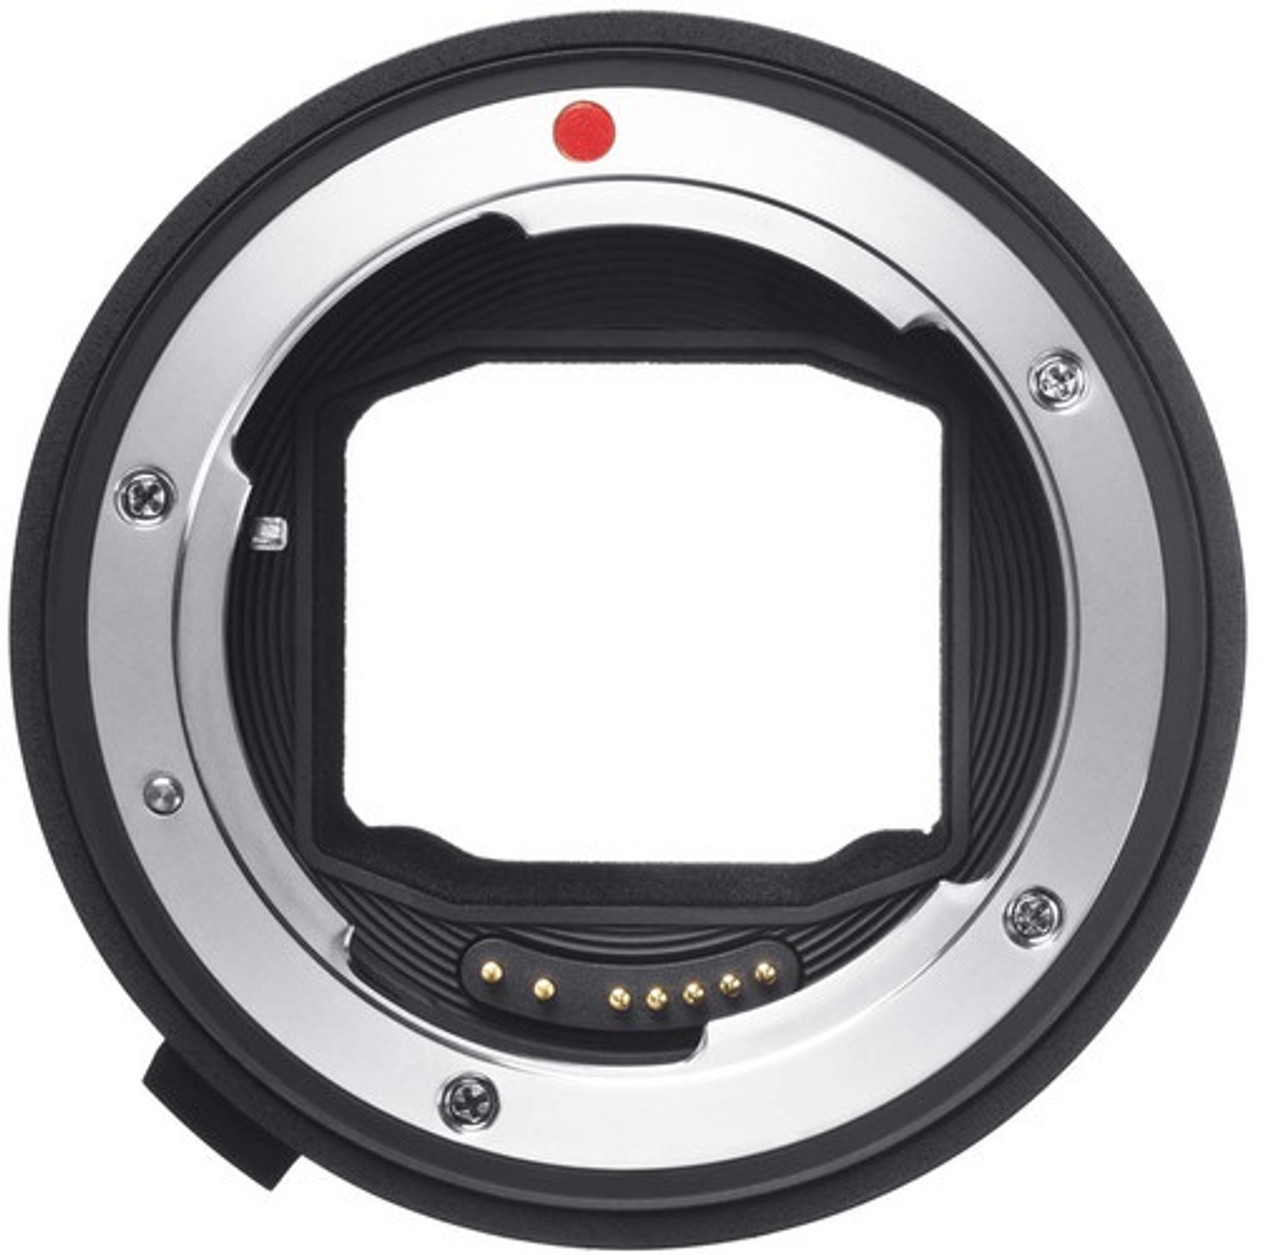 Sigma MC-11 Mount Converter - Sony E Mount for Canon Mount Lenses